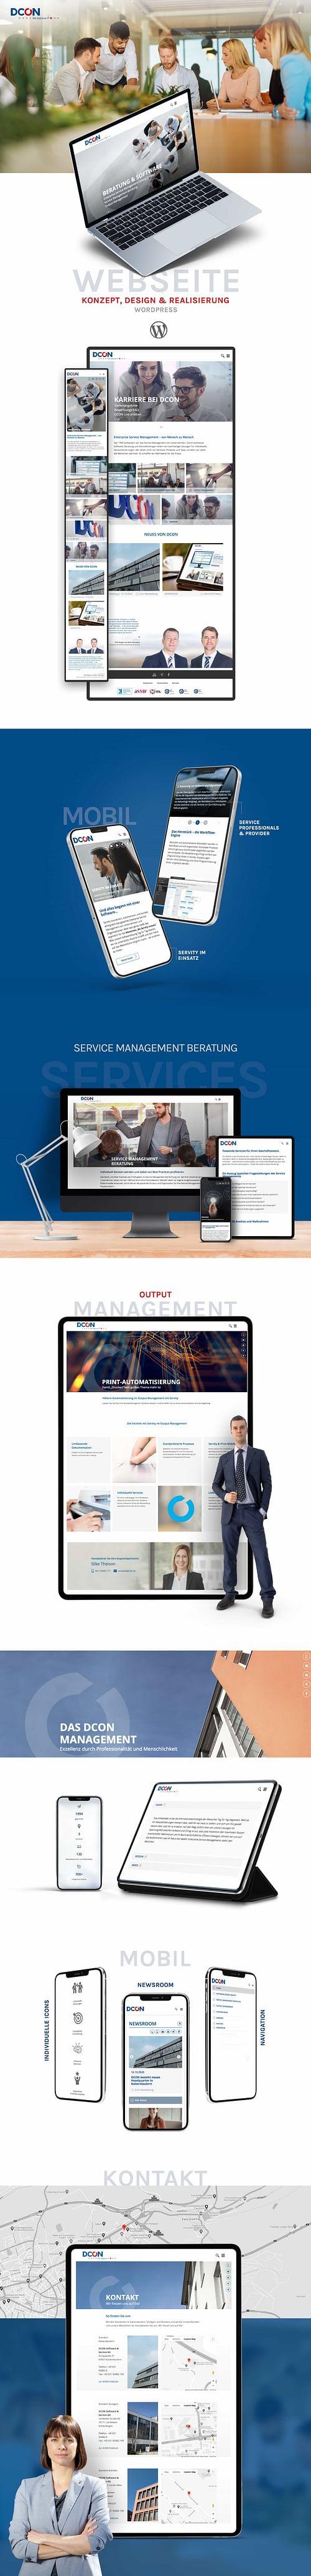 DCON - Web Application